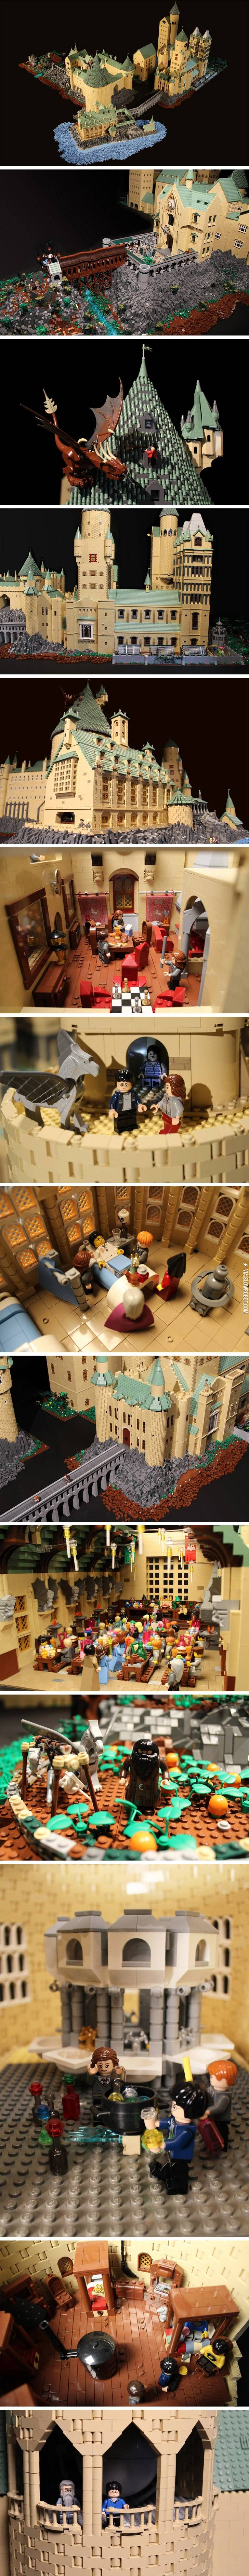 Hogwarts in Legos by Alice Finch.